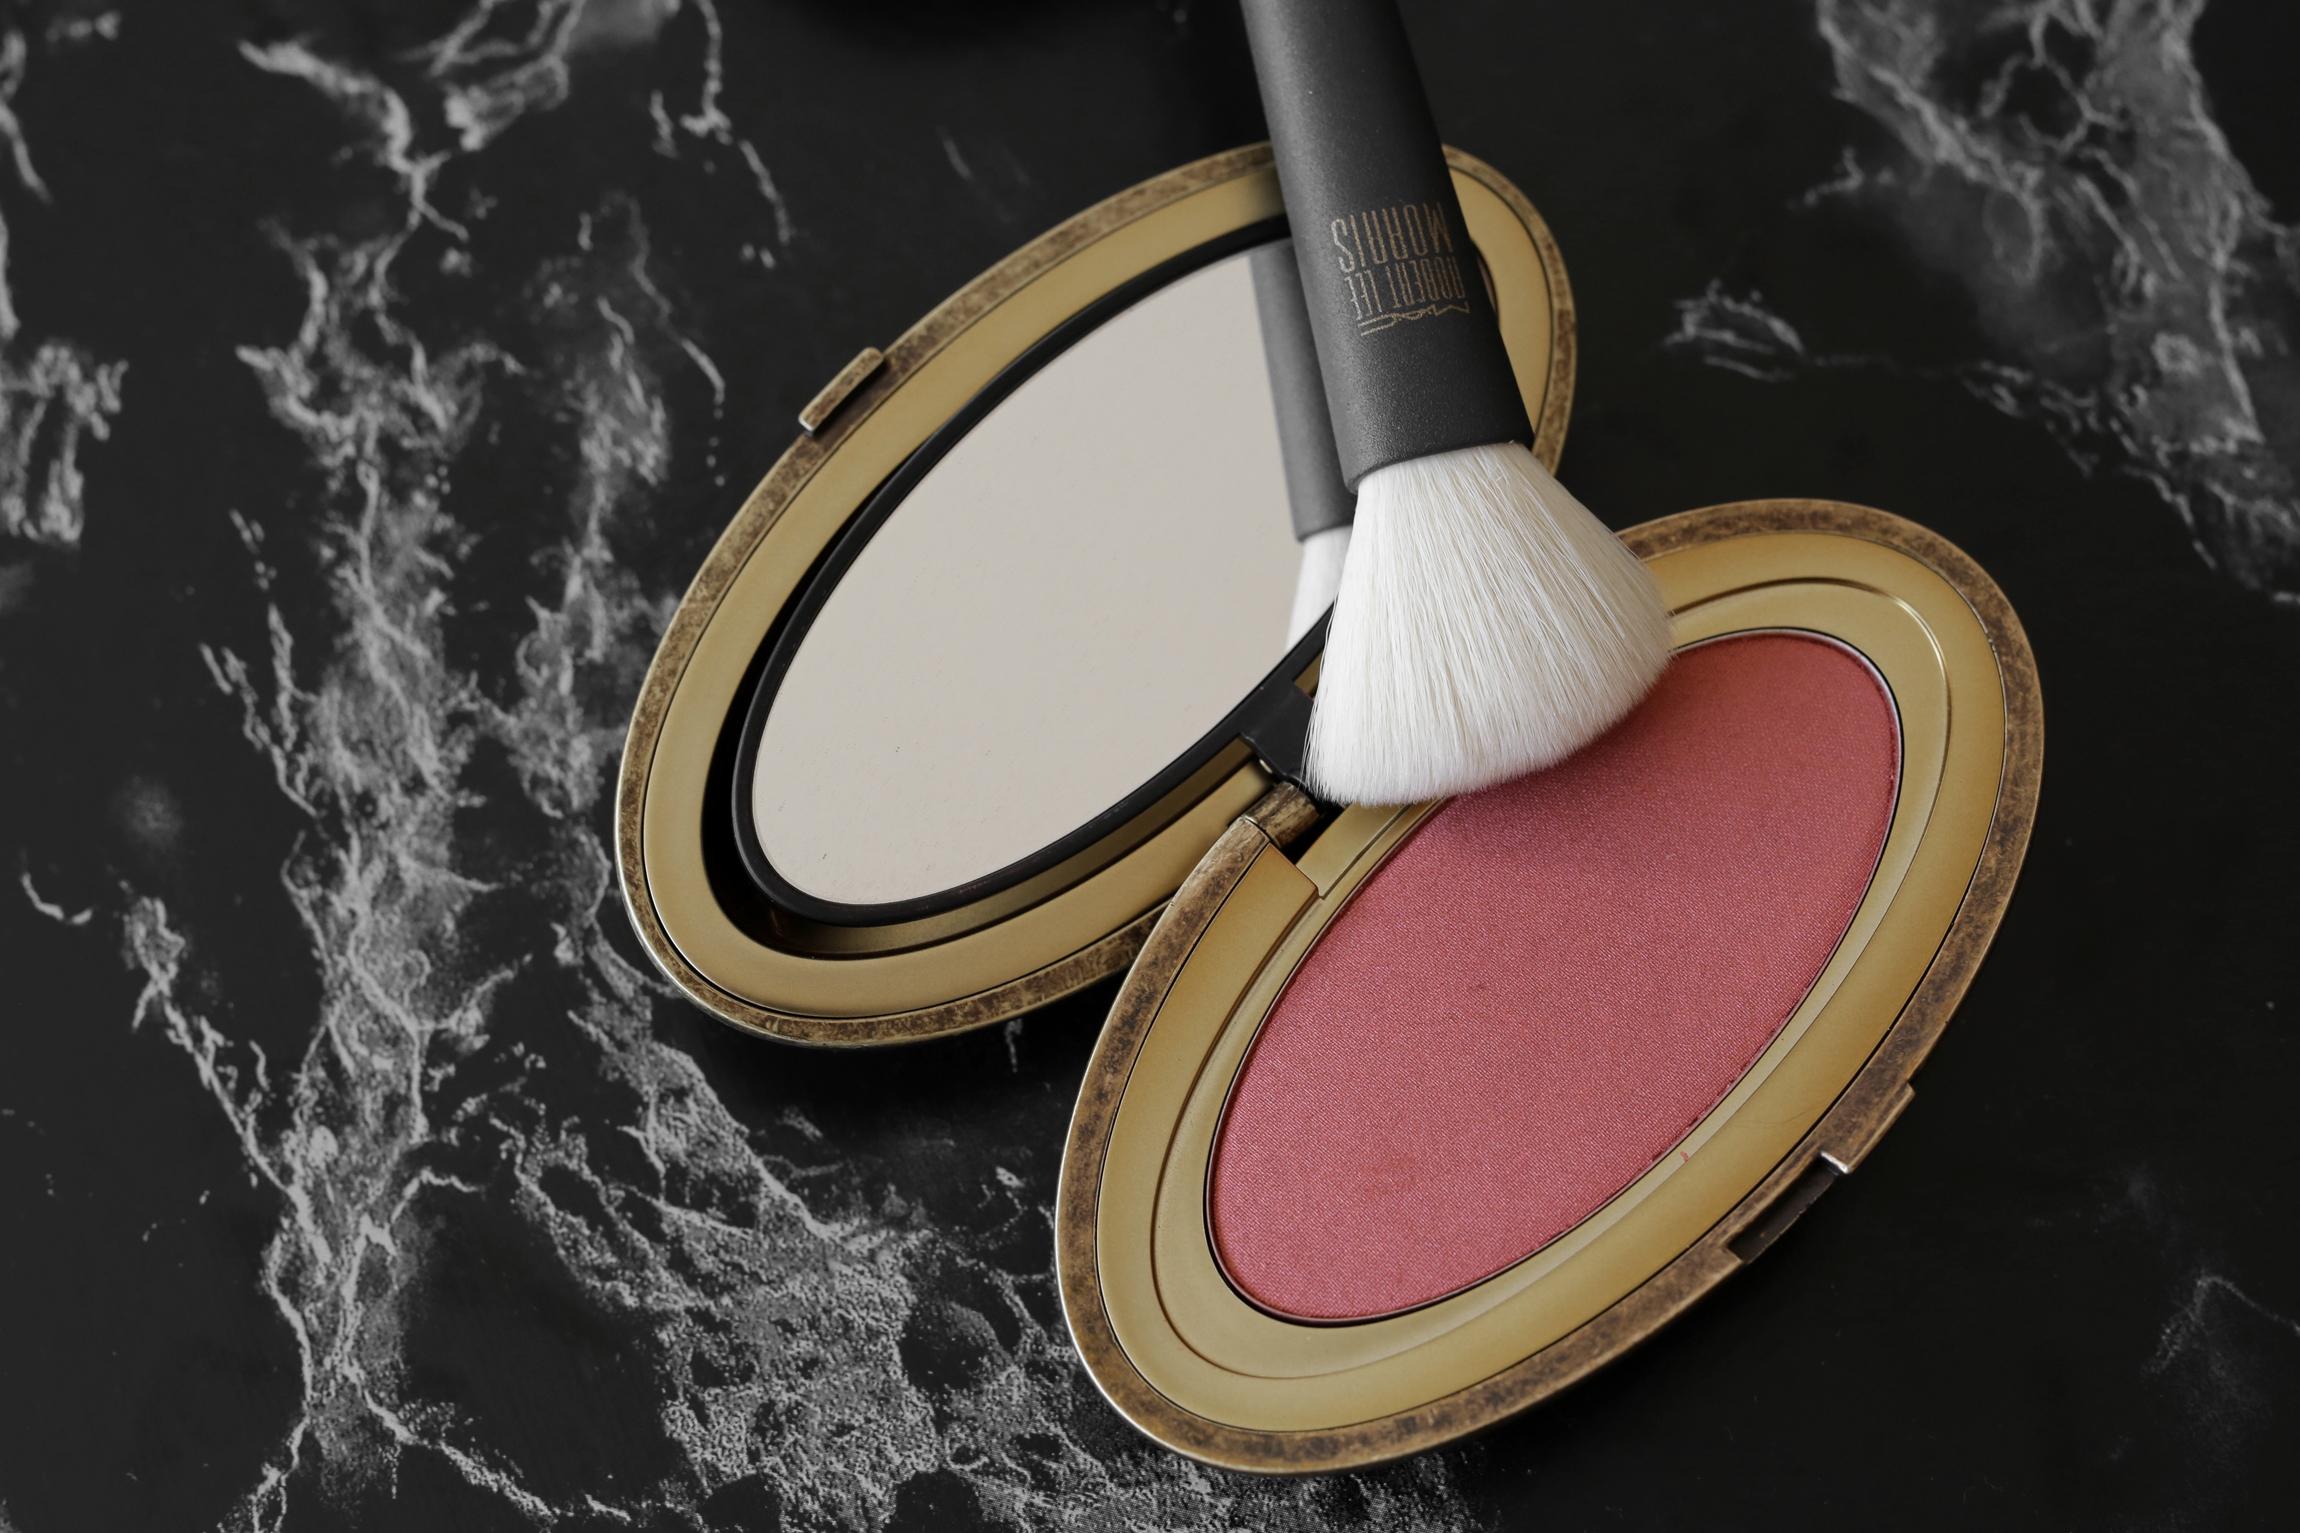 MAC x Robert Lee Morris makeup collection 2017 lipstick, blush, powder, compact, brush, beauty_5518.jpg